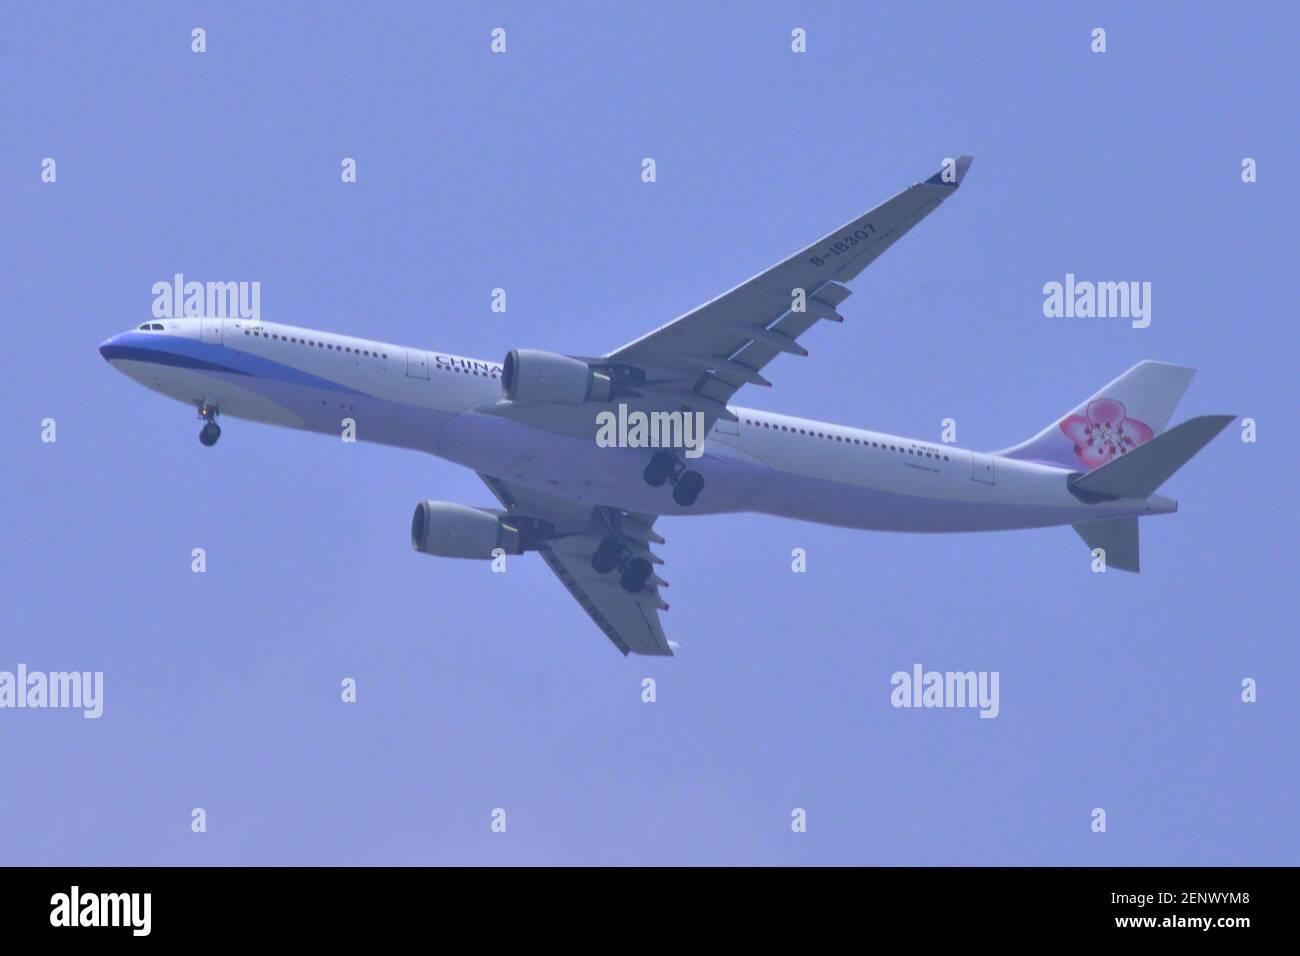 China Airlines, Taiwan, Airbus, A330-300, B-18307, Final approach, Landing, Tokyo Haneda Airport, Tokyo, Japan Stock Photo